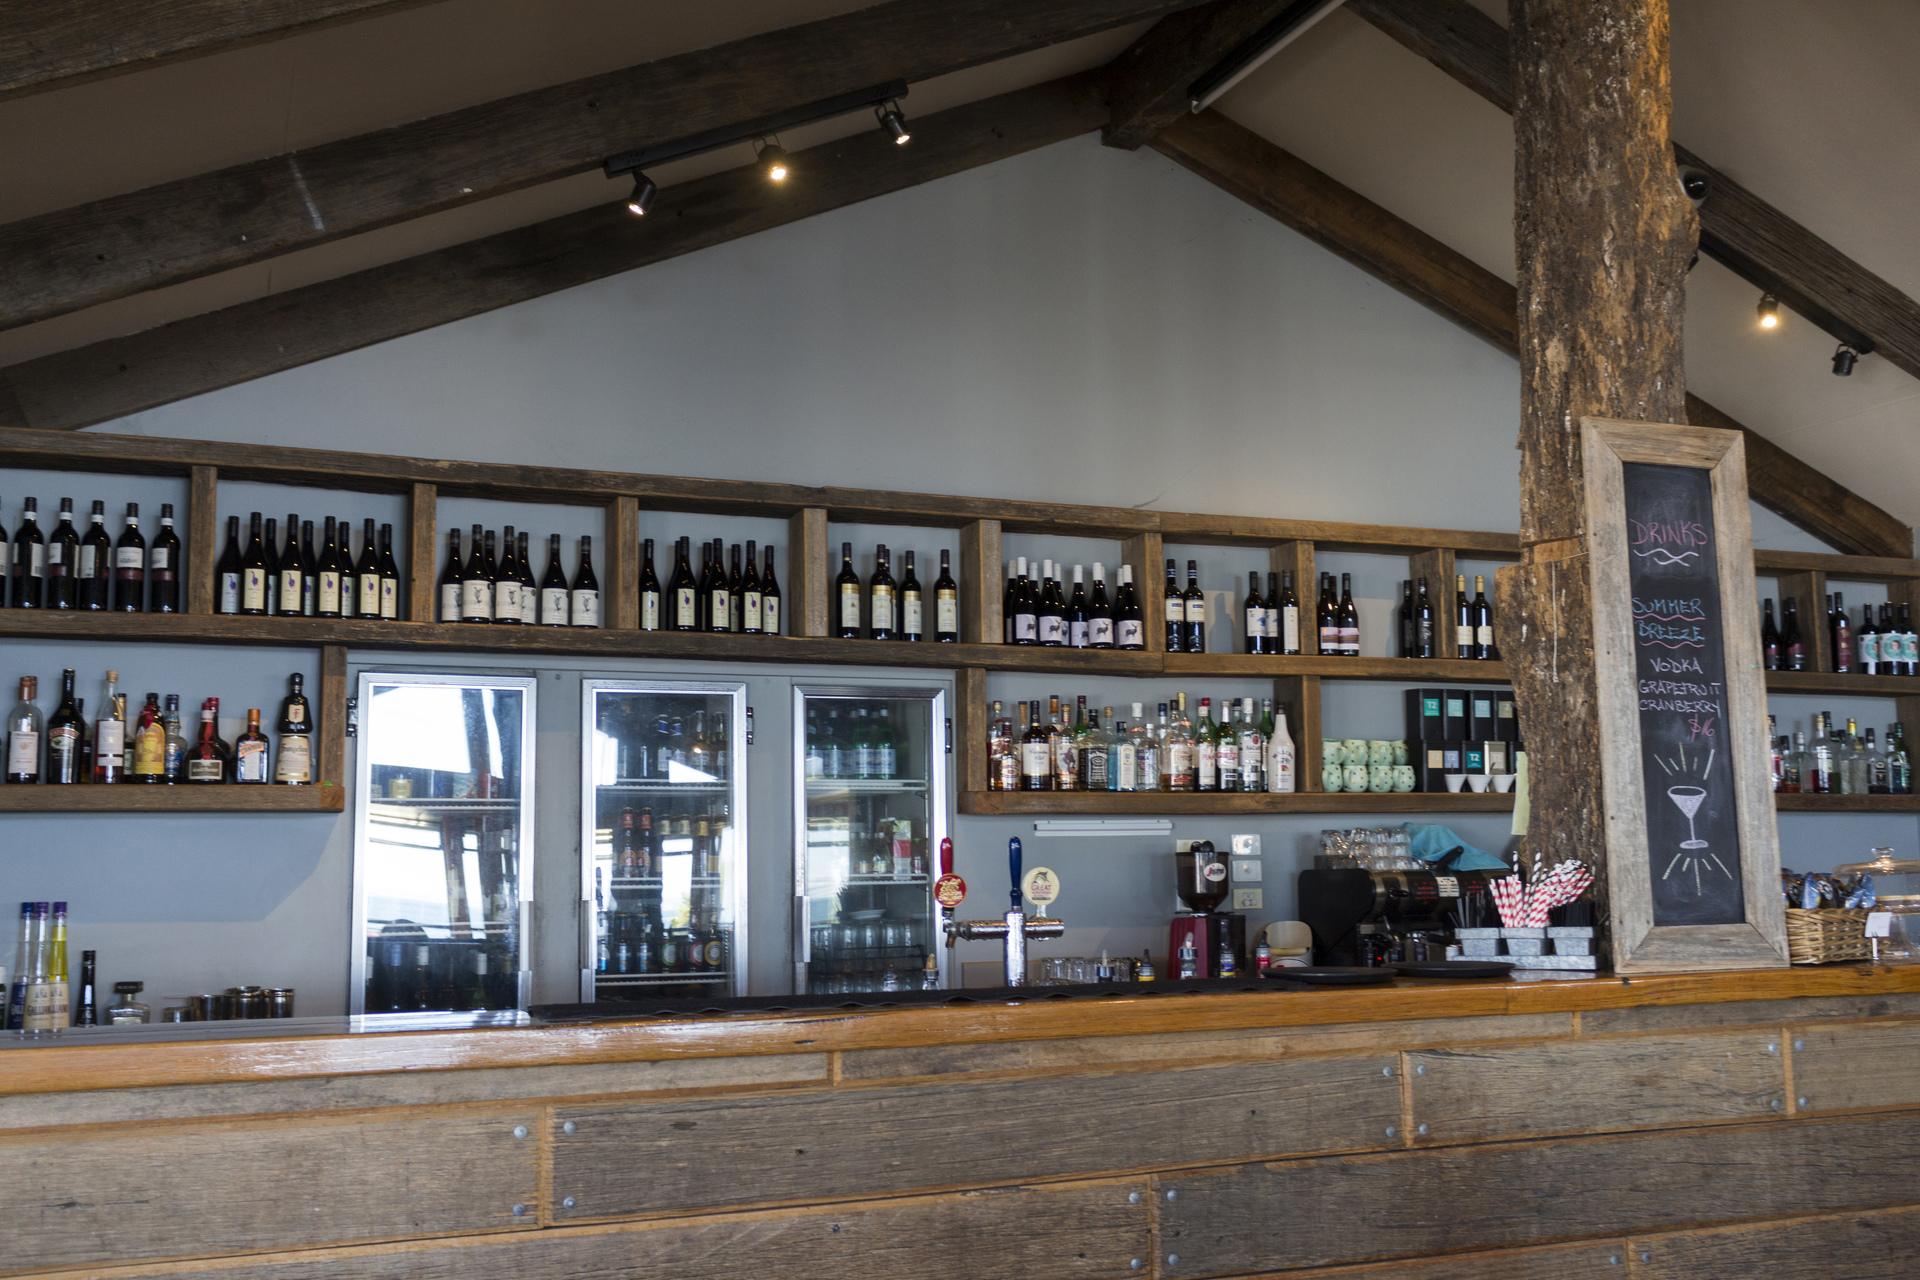 c - The Foreshore Bar & Restaurant